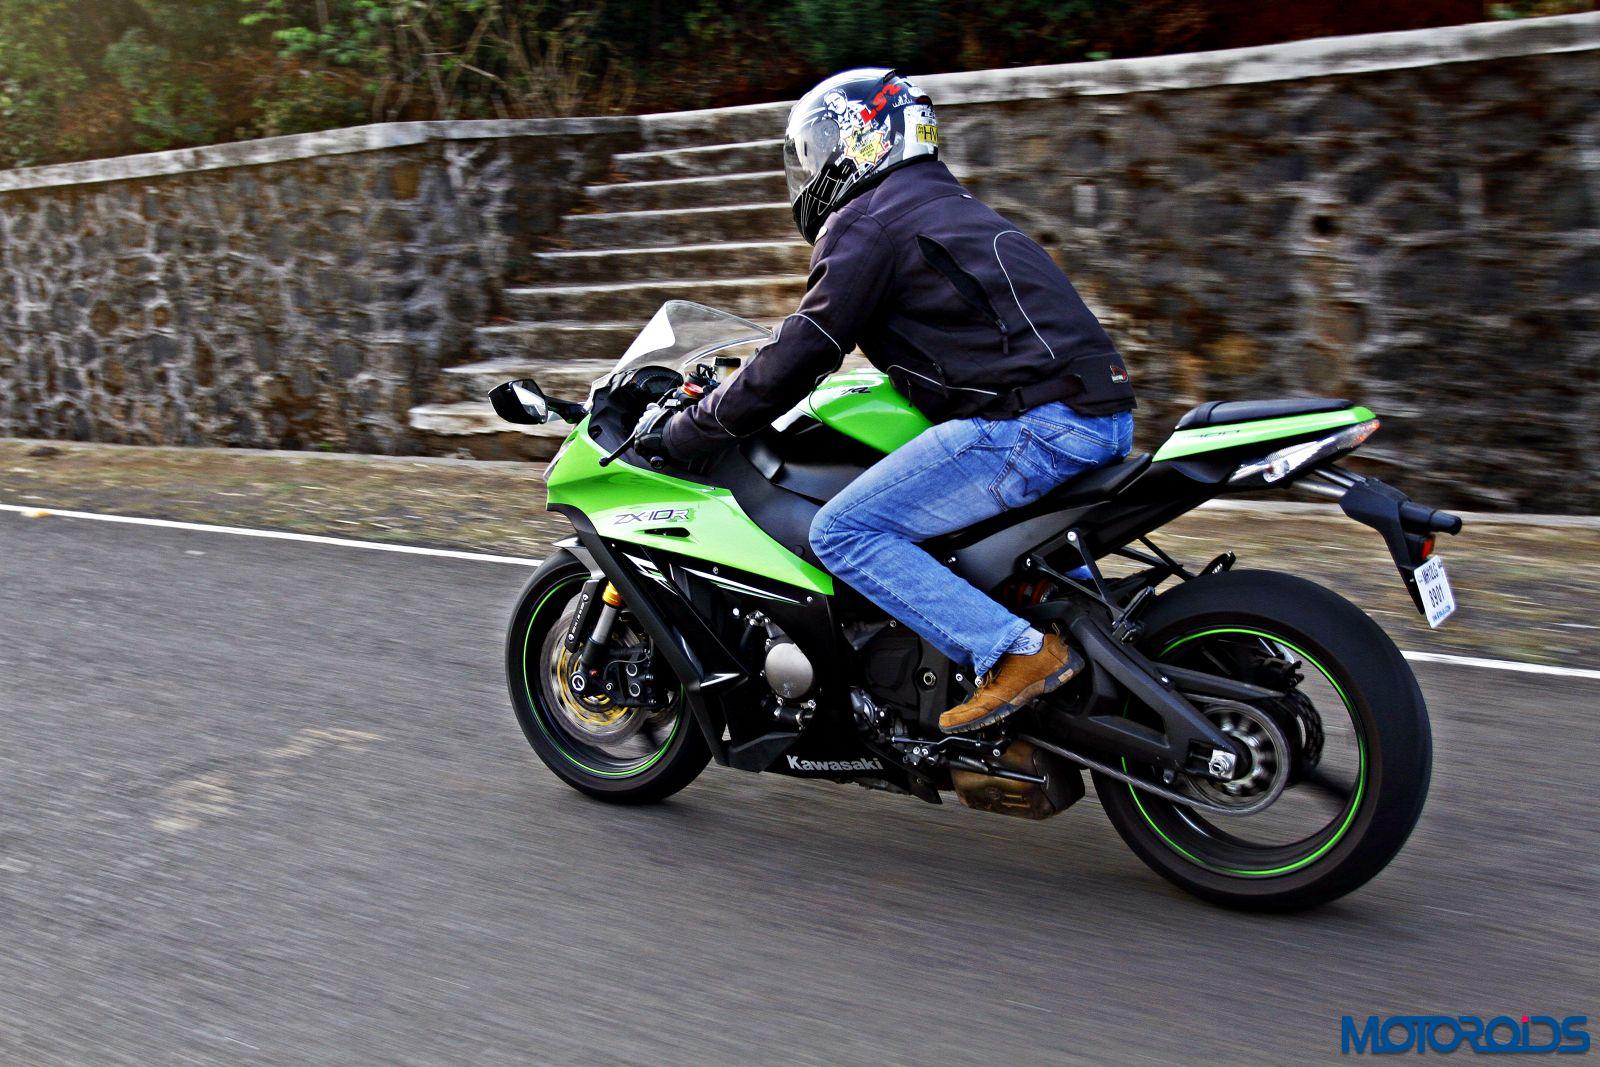 Kawasaki Ninja ZX-14R-riding-left side